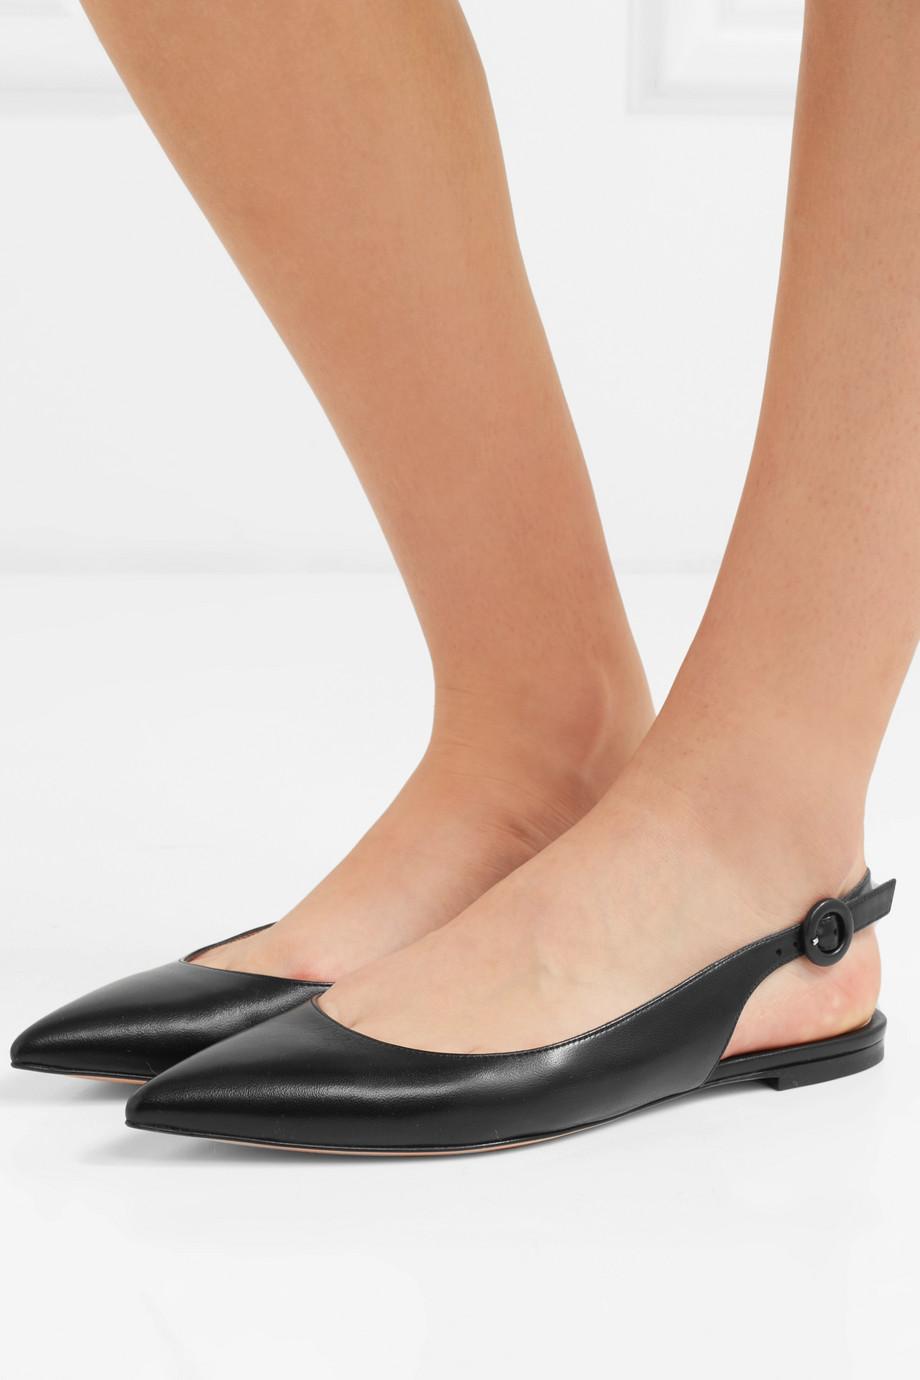 Gianvito Rossi Leather slingback point-toe flats